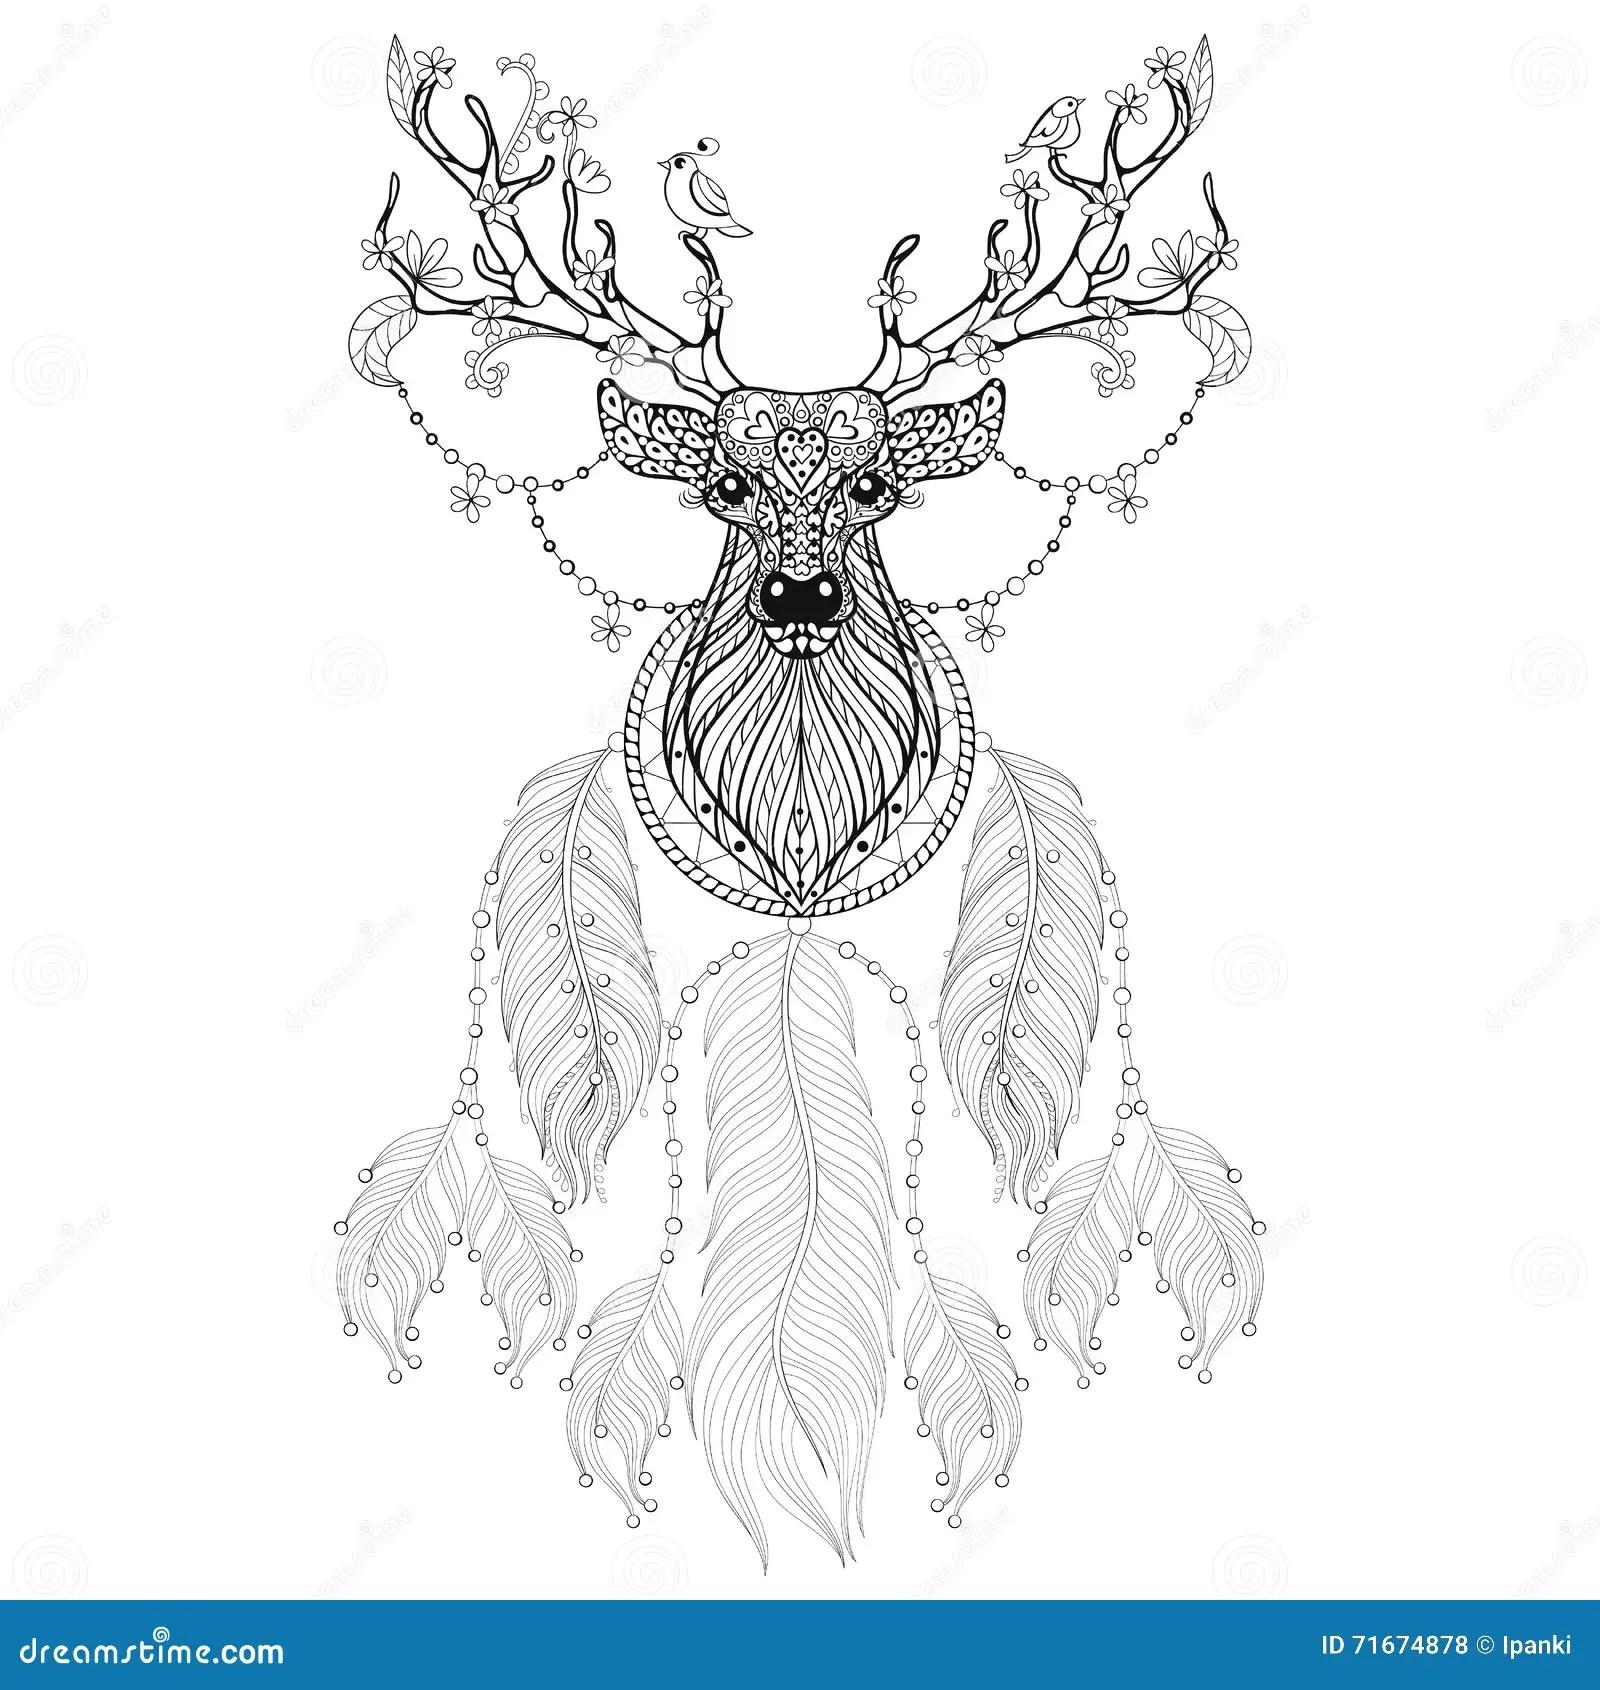 Hand Drawn Zentangle Dreamcatcher With Tribal Hprned Deer